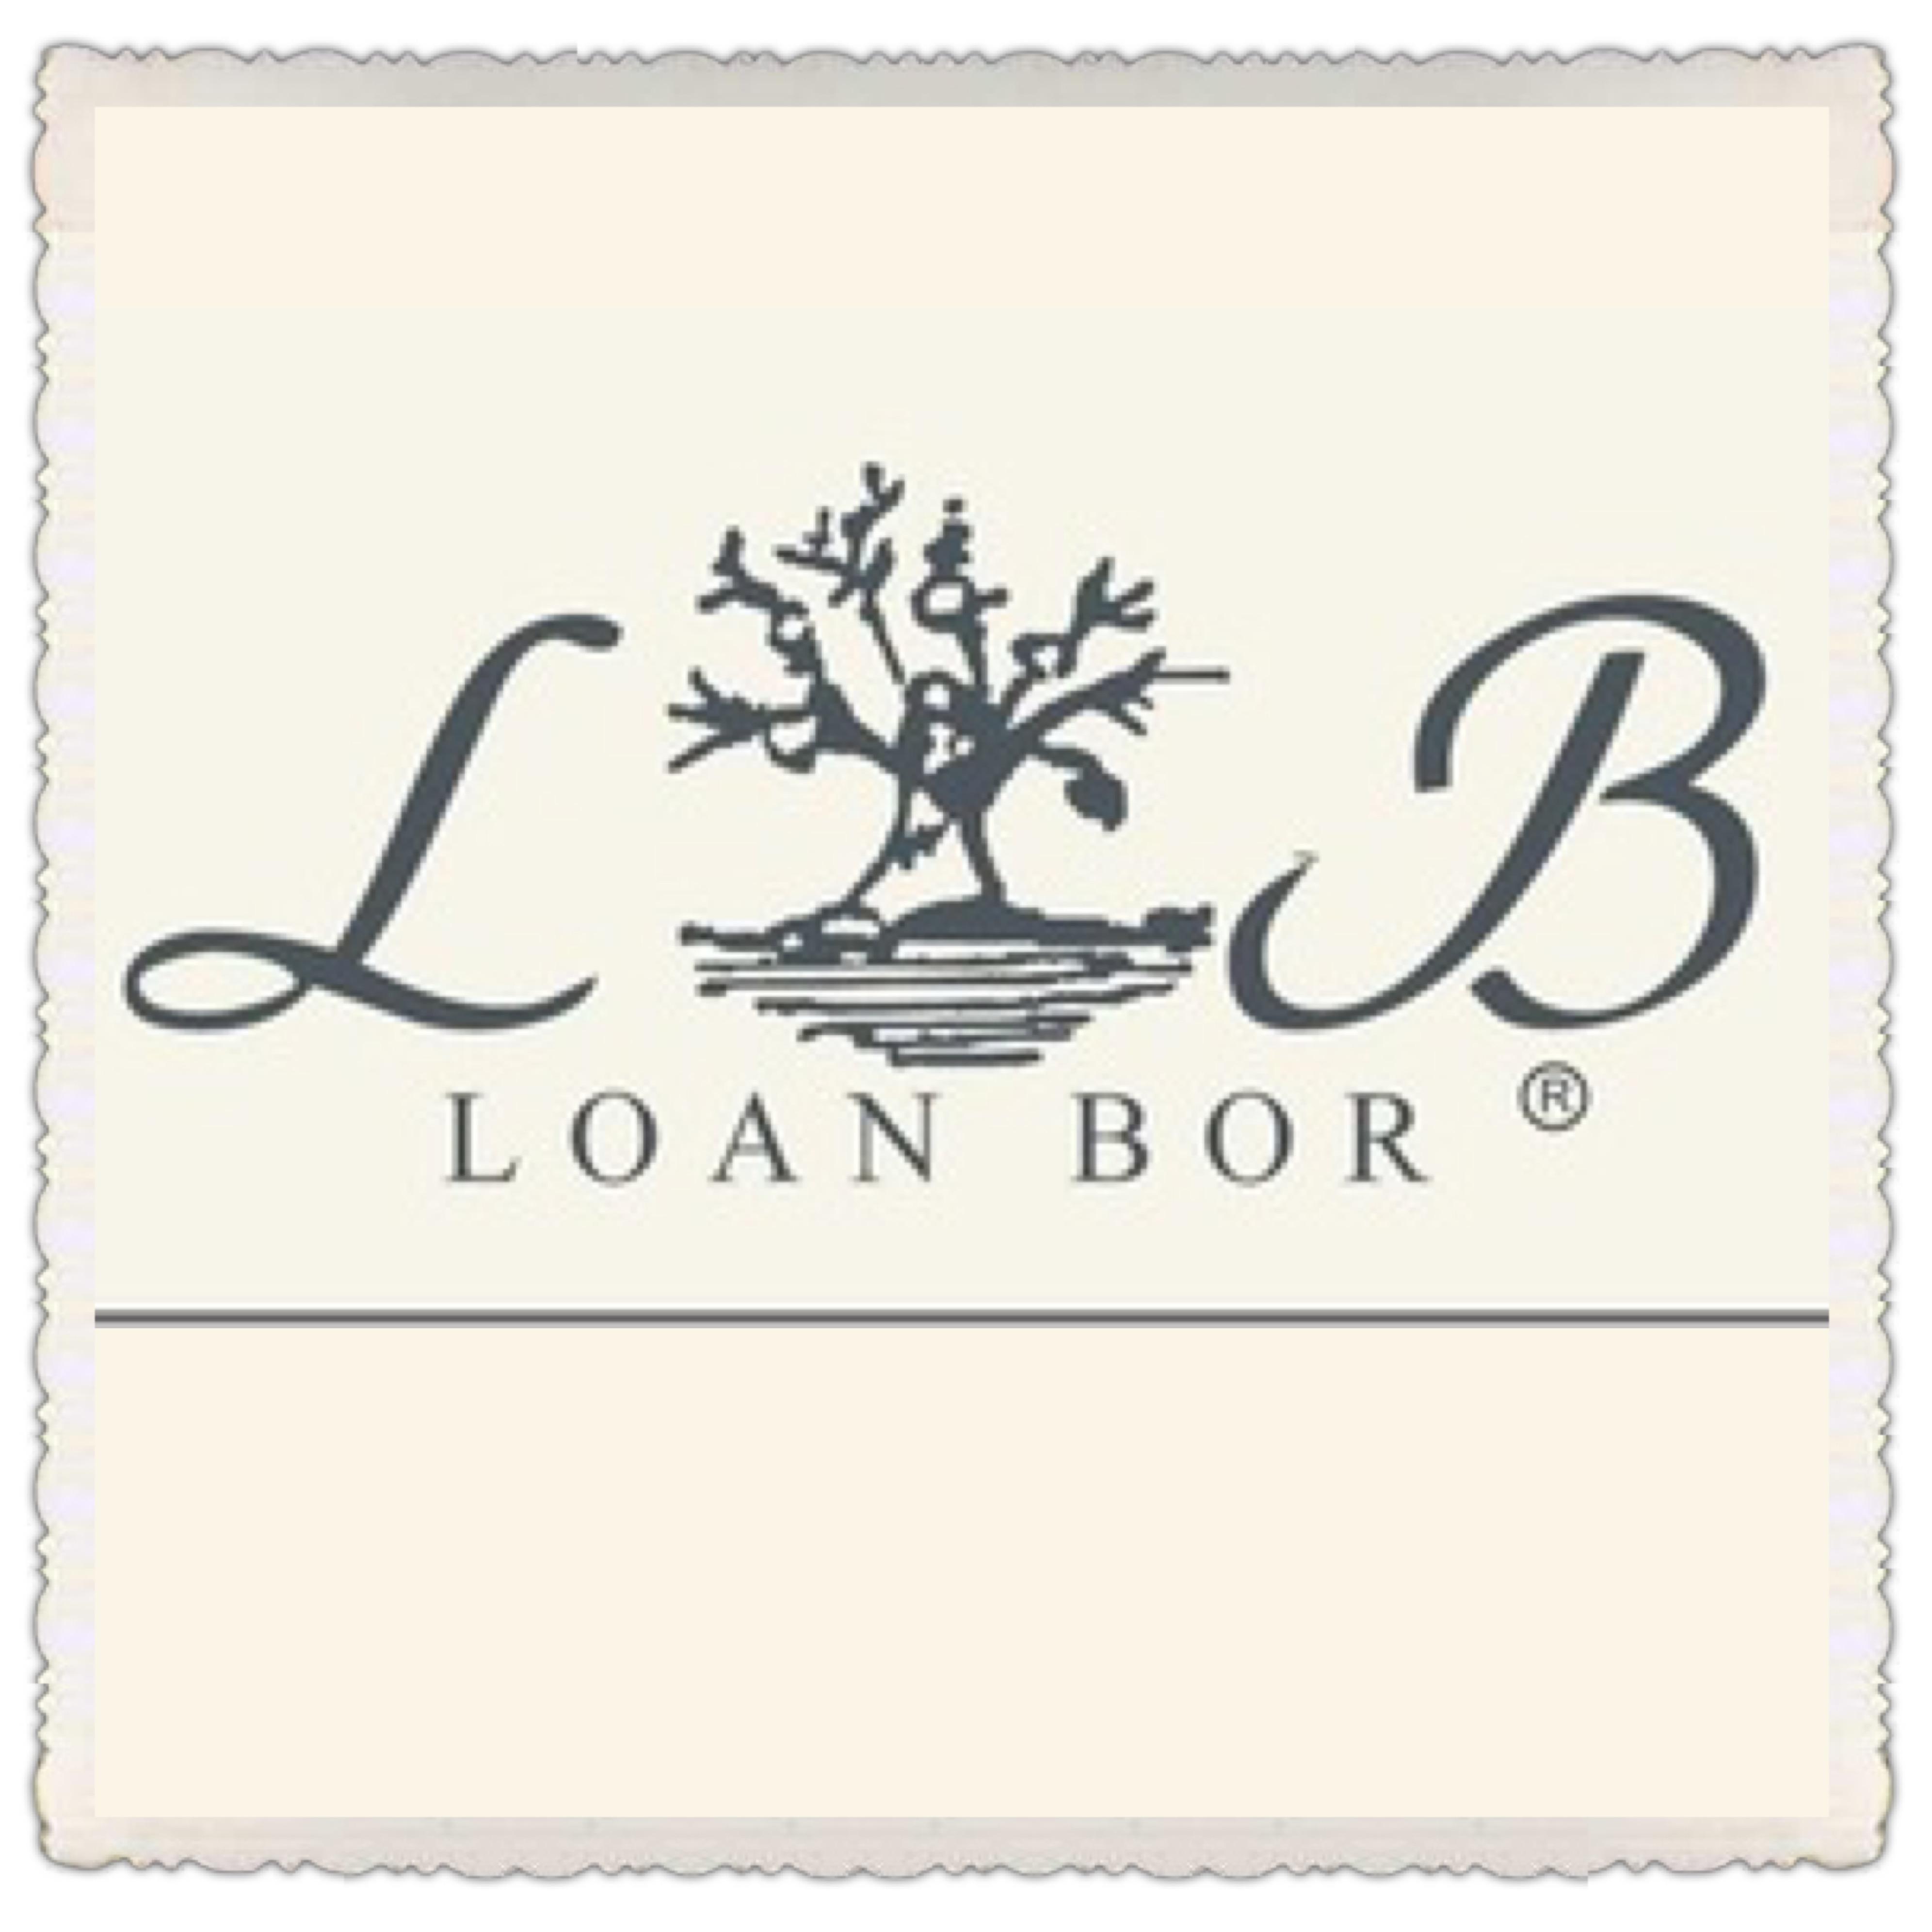 Loan Bor